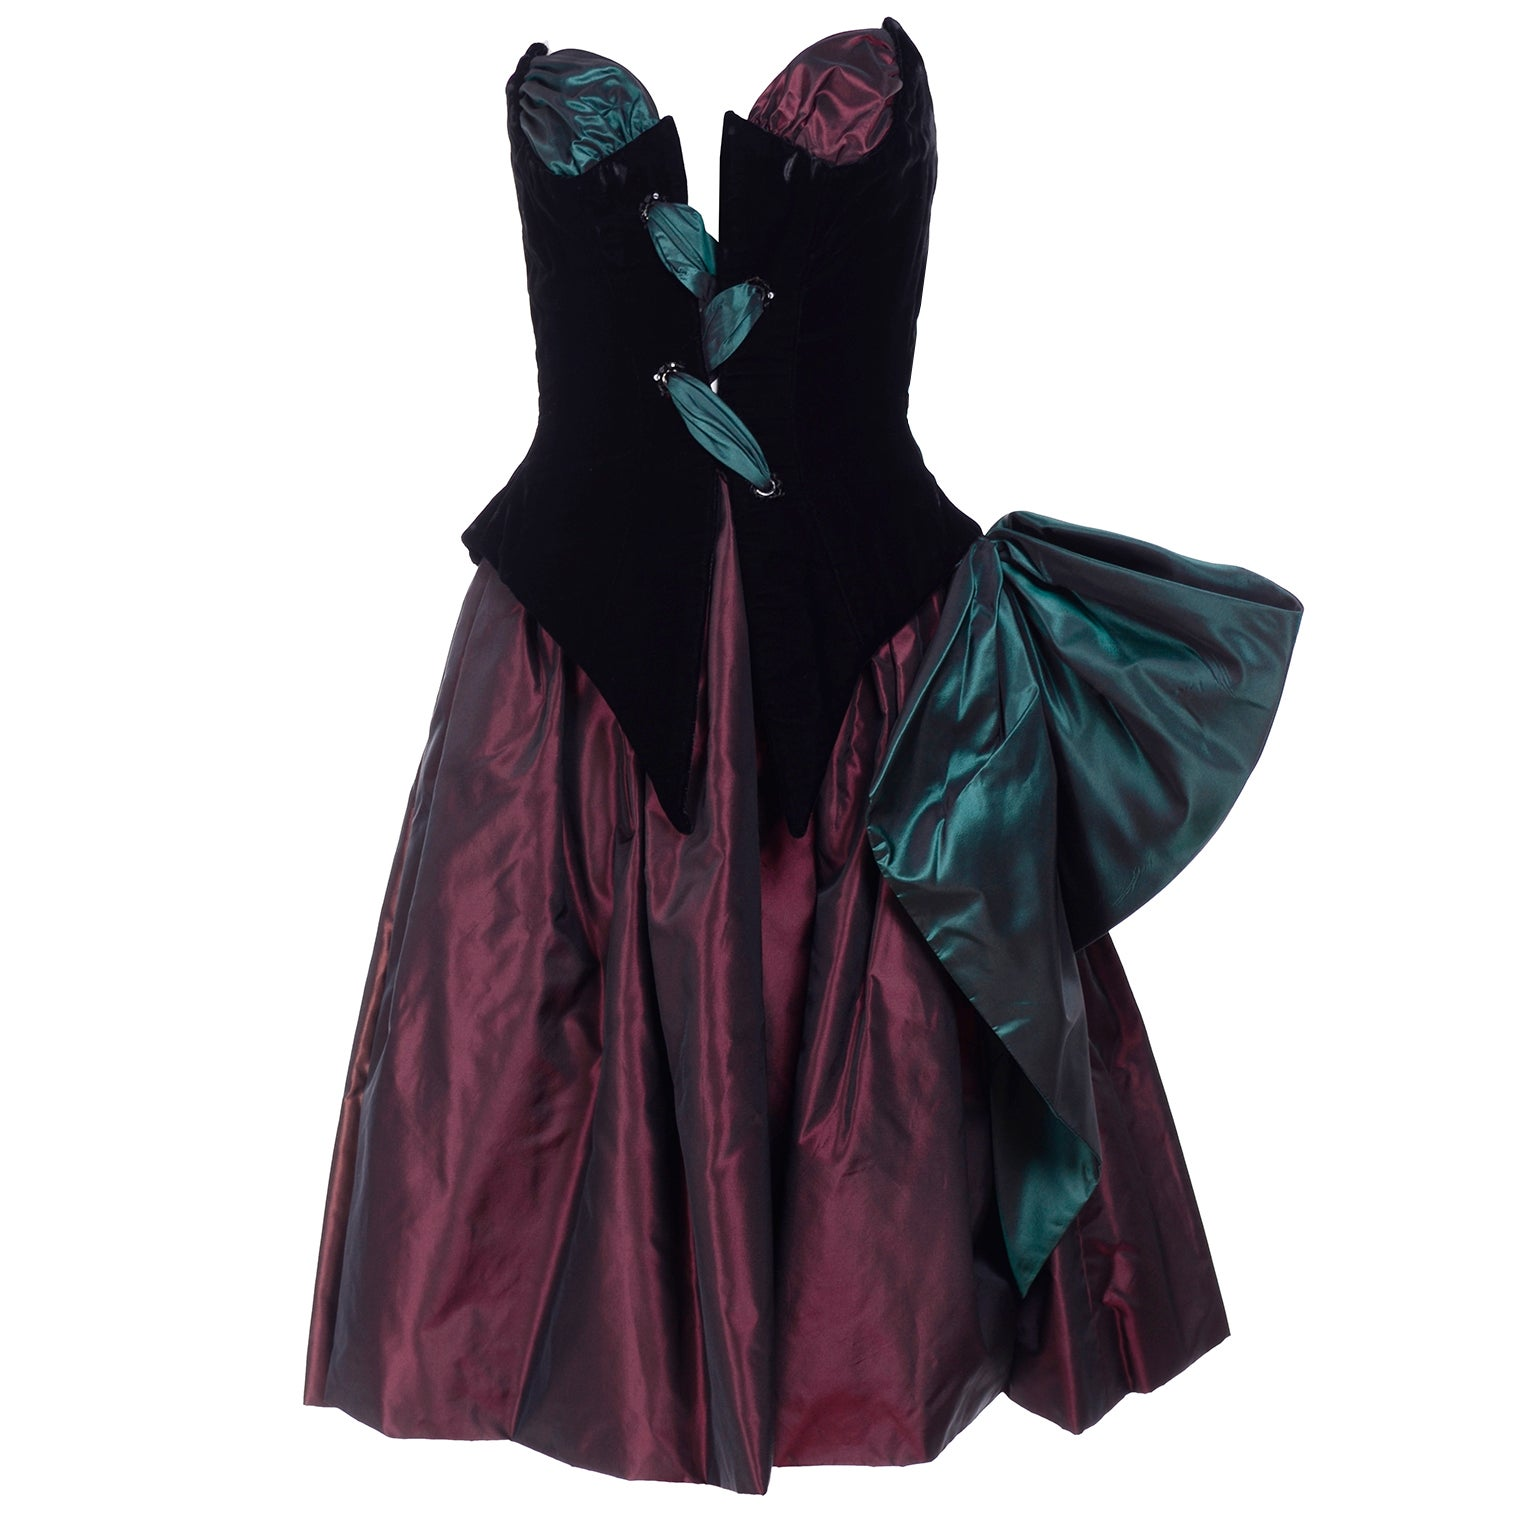 Bob Mackie Green & Wine Velvet & Taffeta Vintage Plunging Corset Dress & Wrap